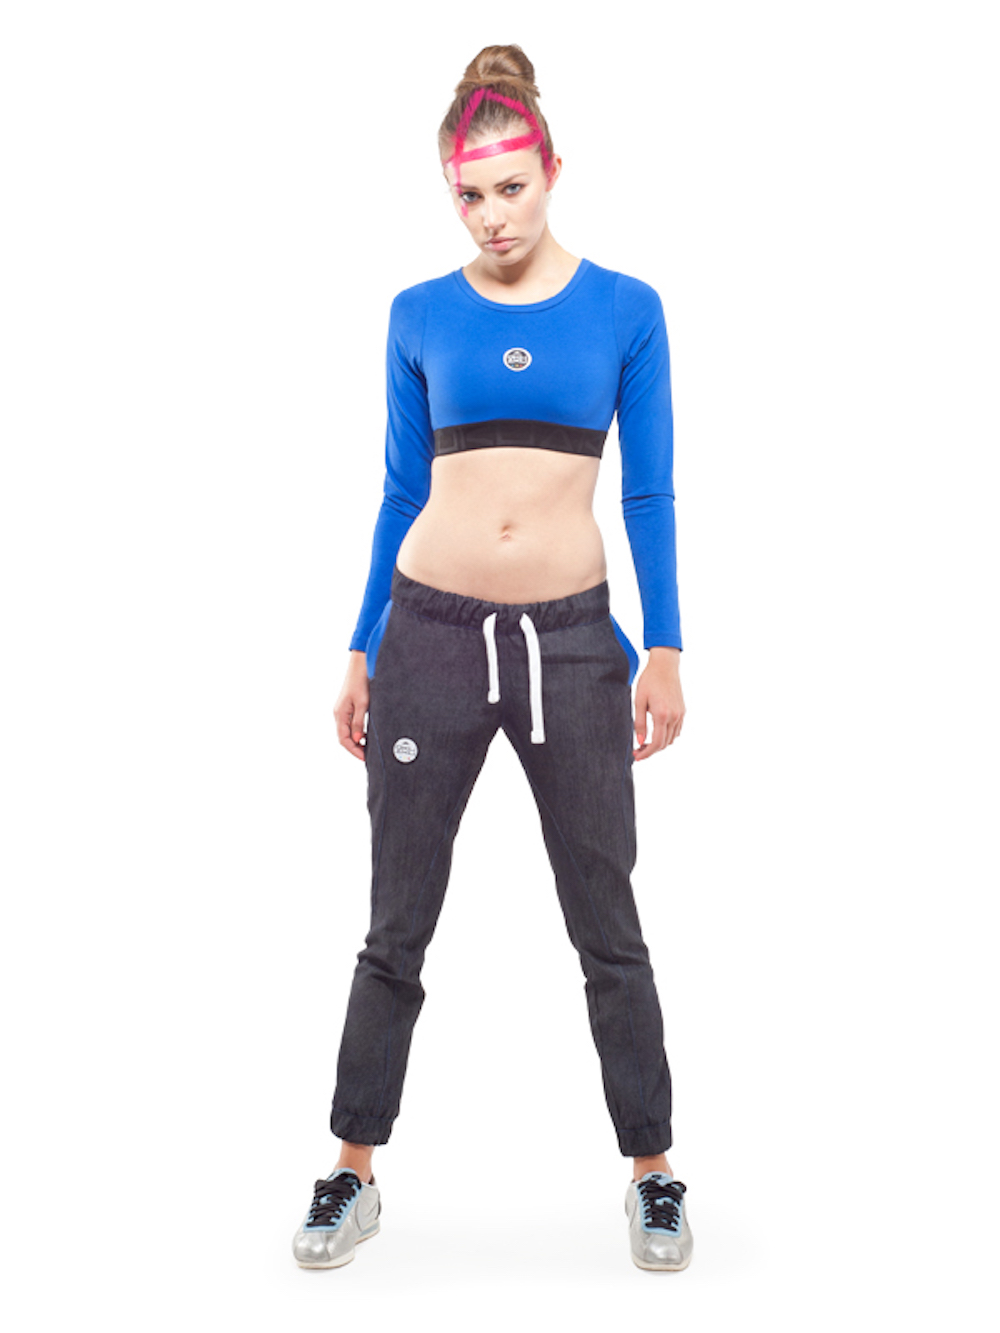 Andromeda Jogger Jeans Pants (Graphite) - Okuaku